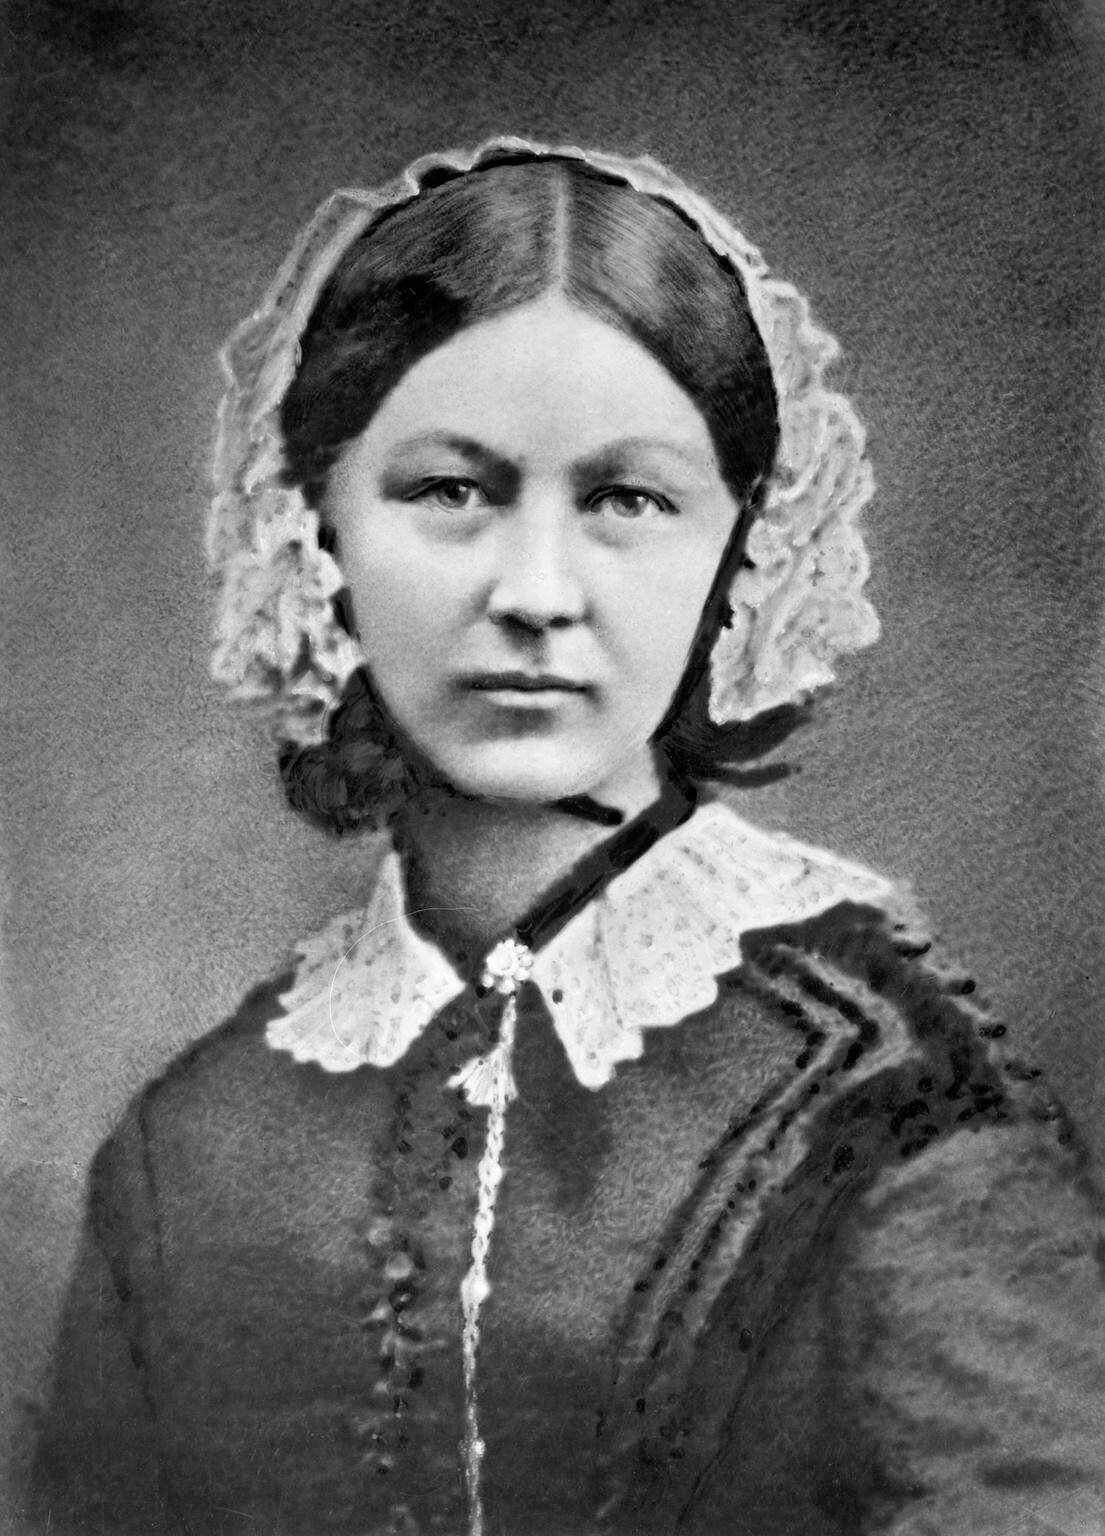 Florence_Nightingale_(H_Hering_NPG_x82368)